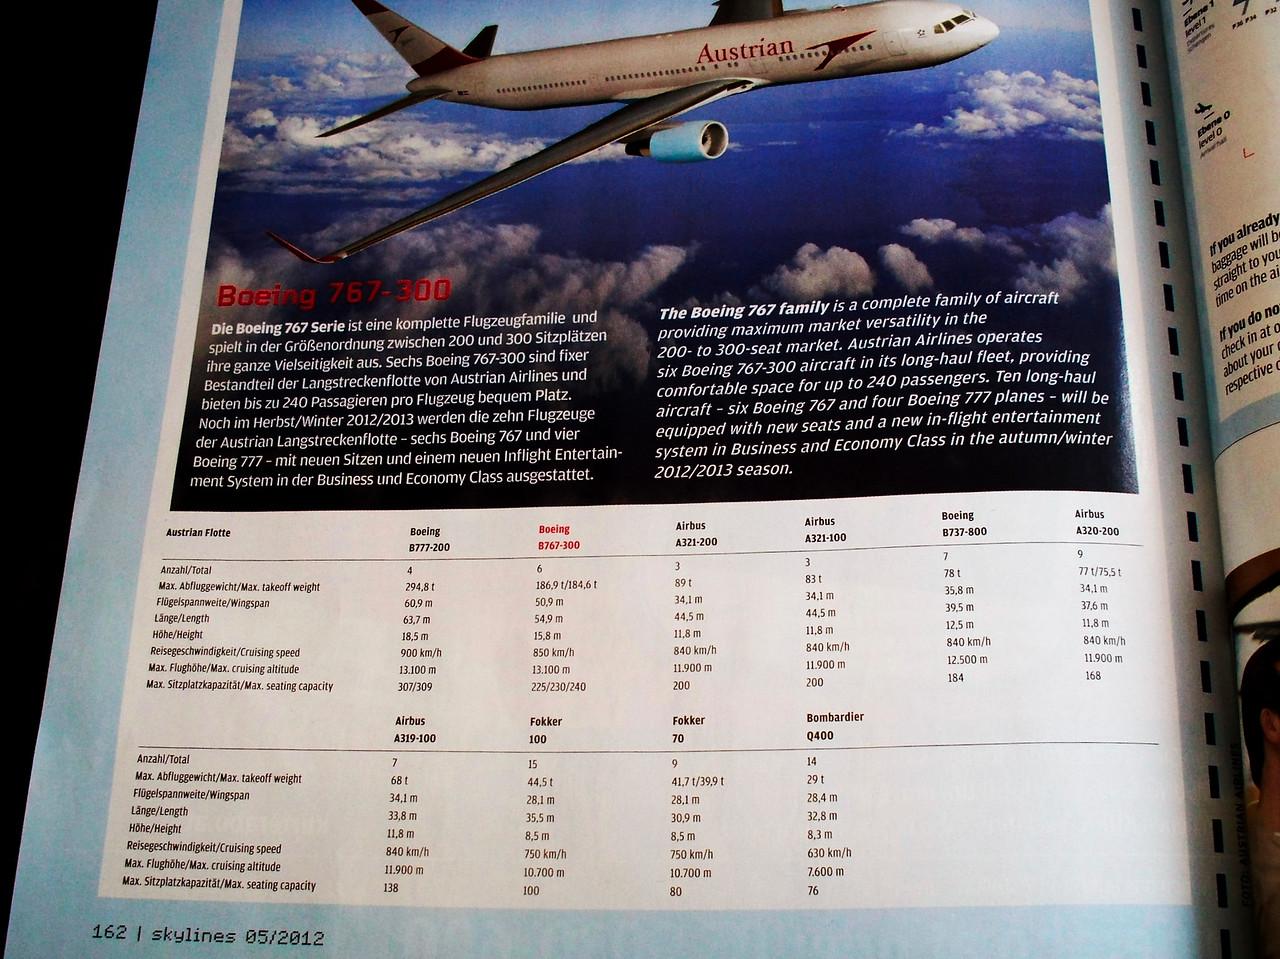 Letecká flotila Austrian Airlines